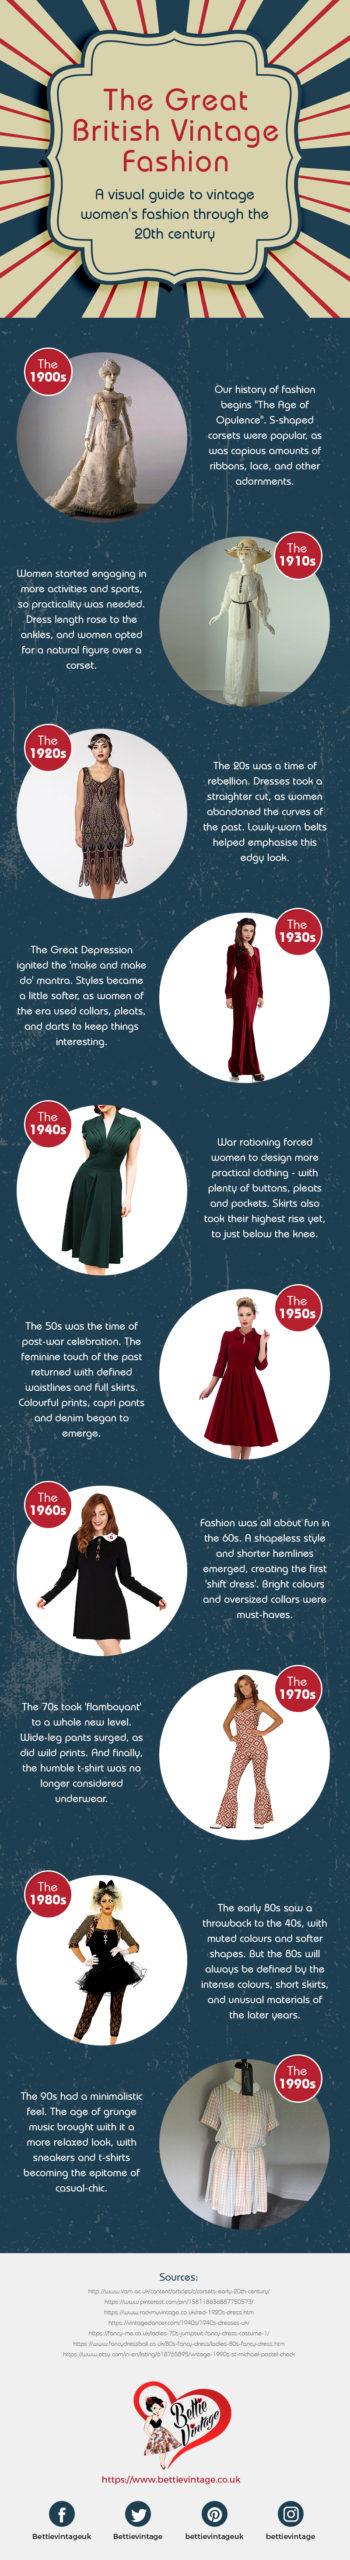 The Great British Vintage Fashion